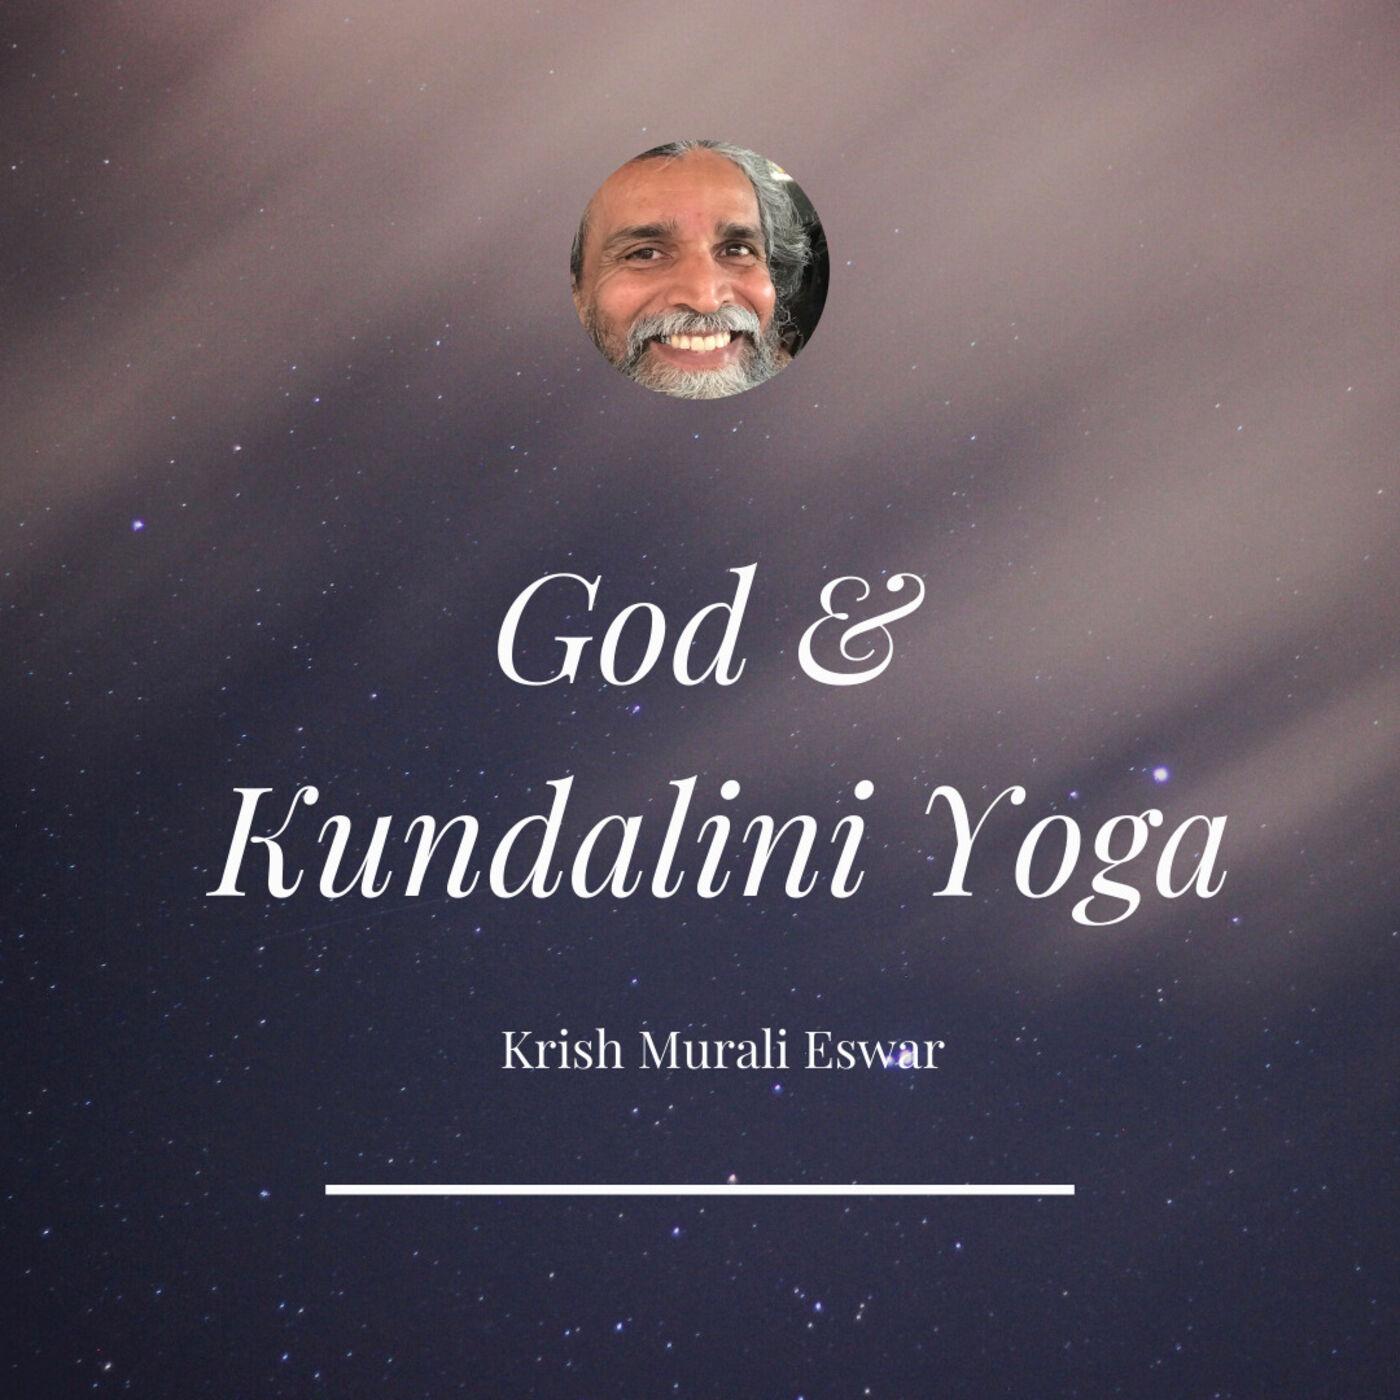 103 God and Kundalini Yoga - Live Discussion with Prof Siva Shankar and Prof Krish Murali Eswar